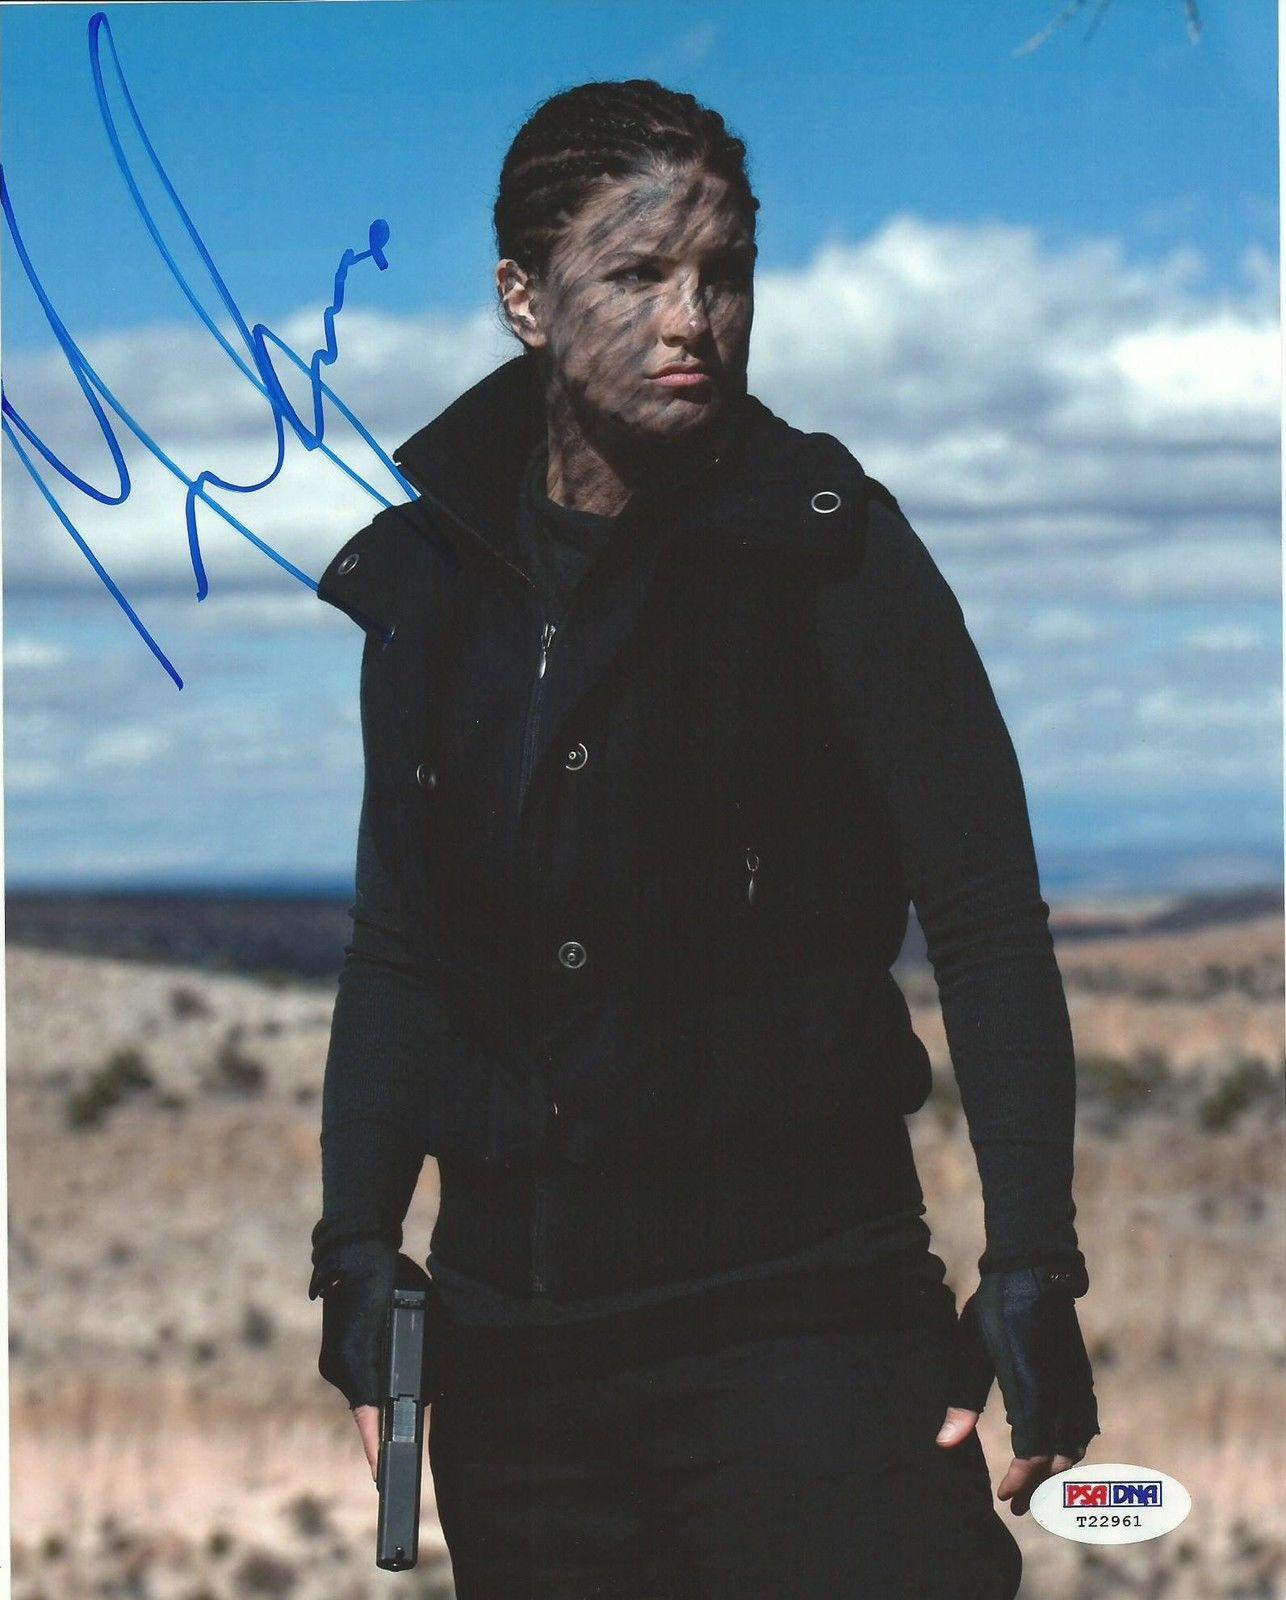 Gina Carano Signed 8x10 Photo PSA/DNA COA Autograph Auto'd Haywire Strikeforce 2